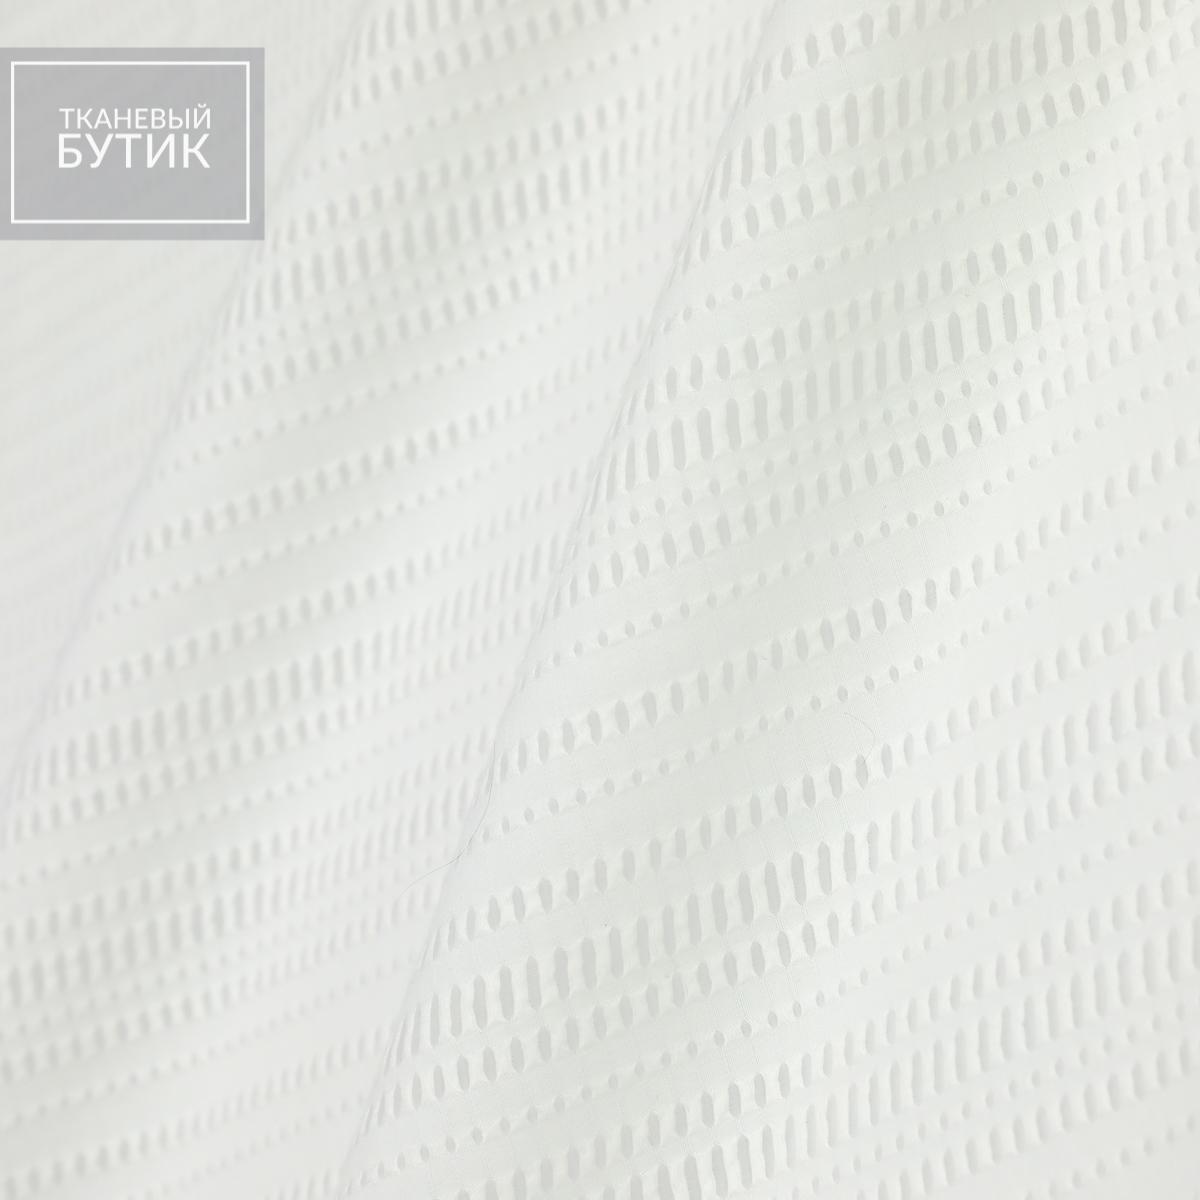 Шелковистый хлопок в декоративную мережку